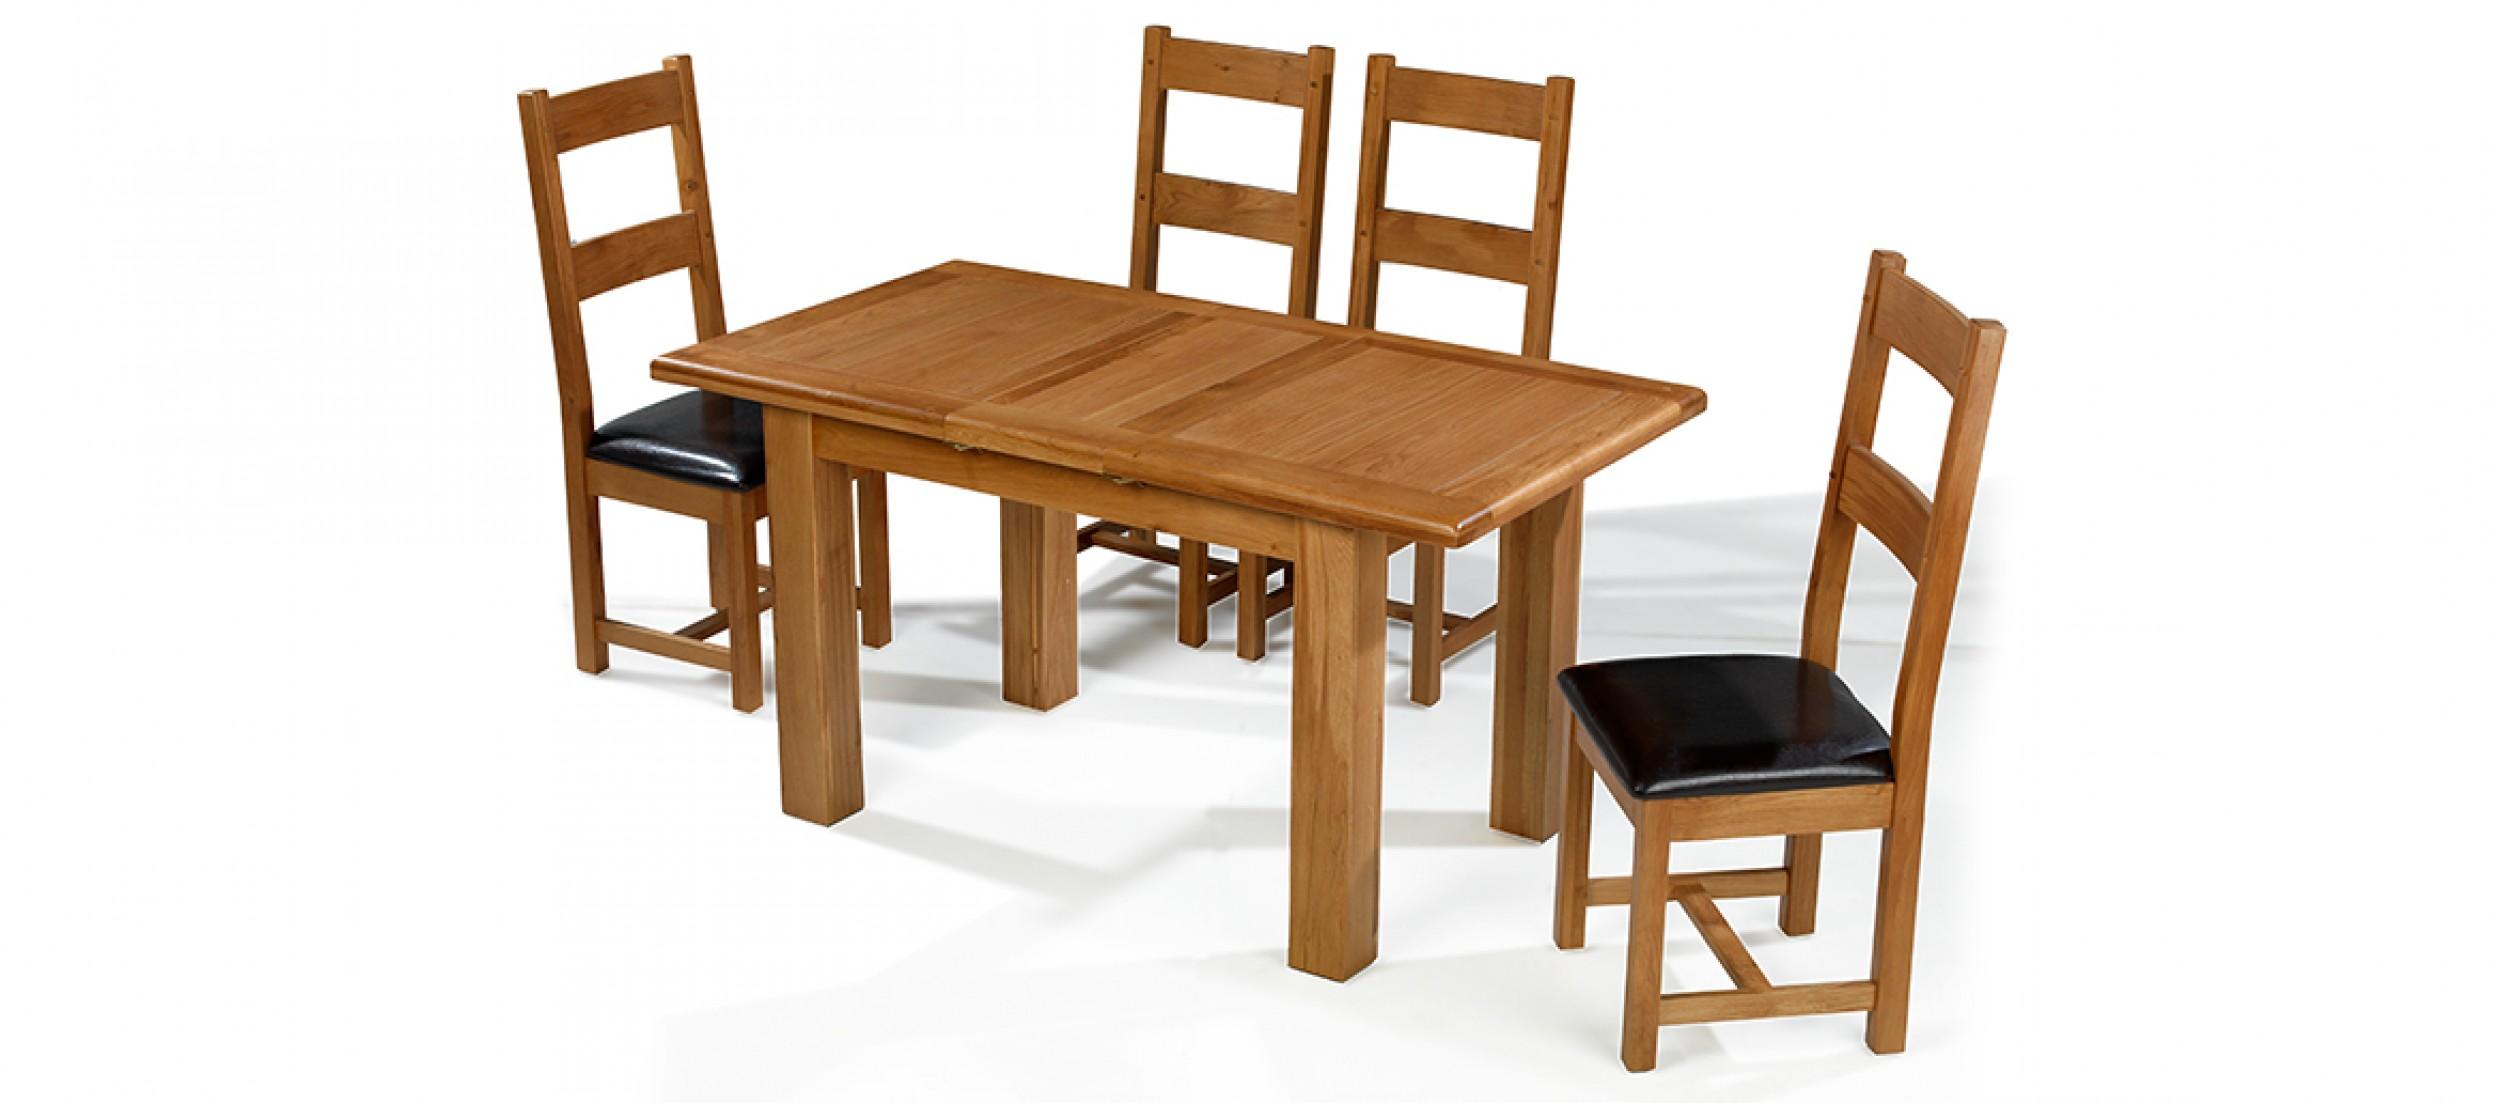 Barham oak 120 150 cm extending dining table and 4 chairs for Extending dining table and chairs